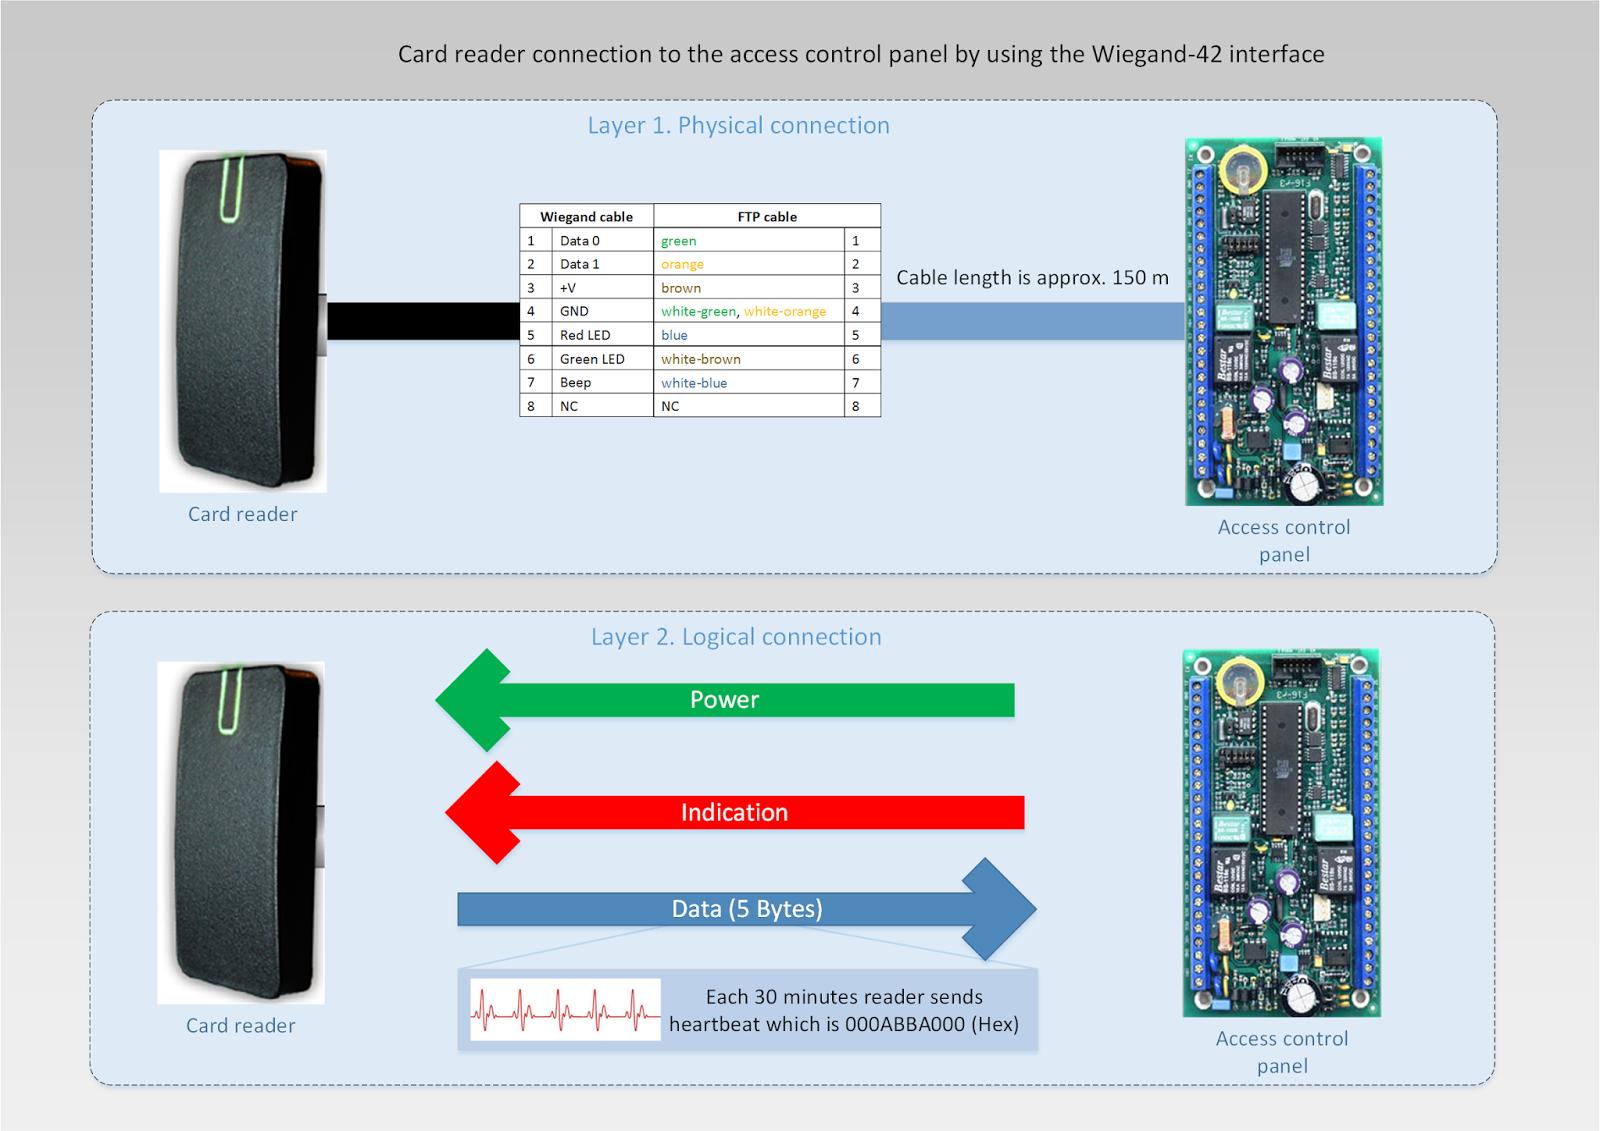 Arindam Bhadra: OSDP an Access Control Protocol by SIA | Wiegand Card Reader Wiring Diagram |  | Arindam Bhadra - blogger